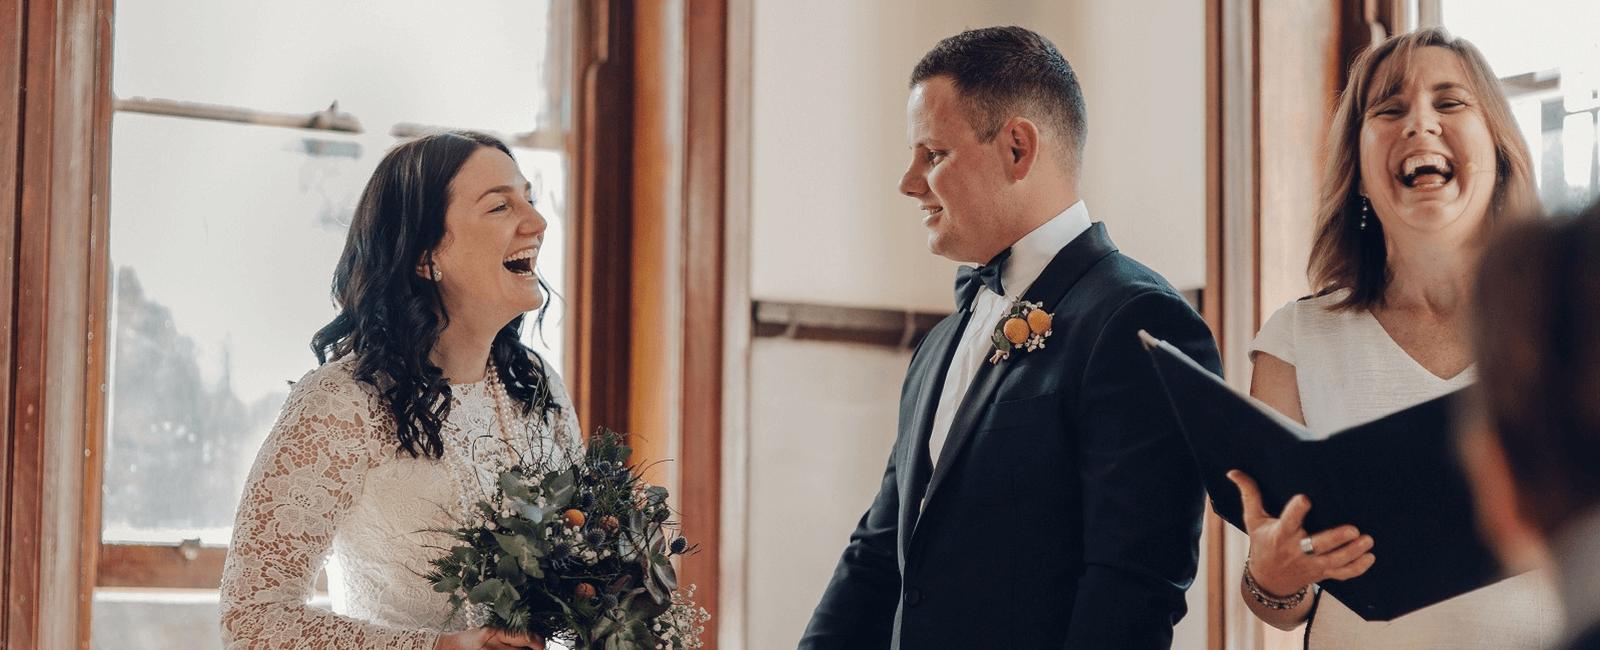 couple laughing wedding ceremony